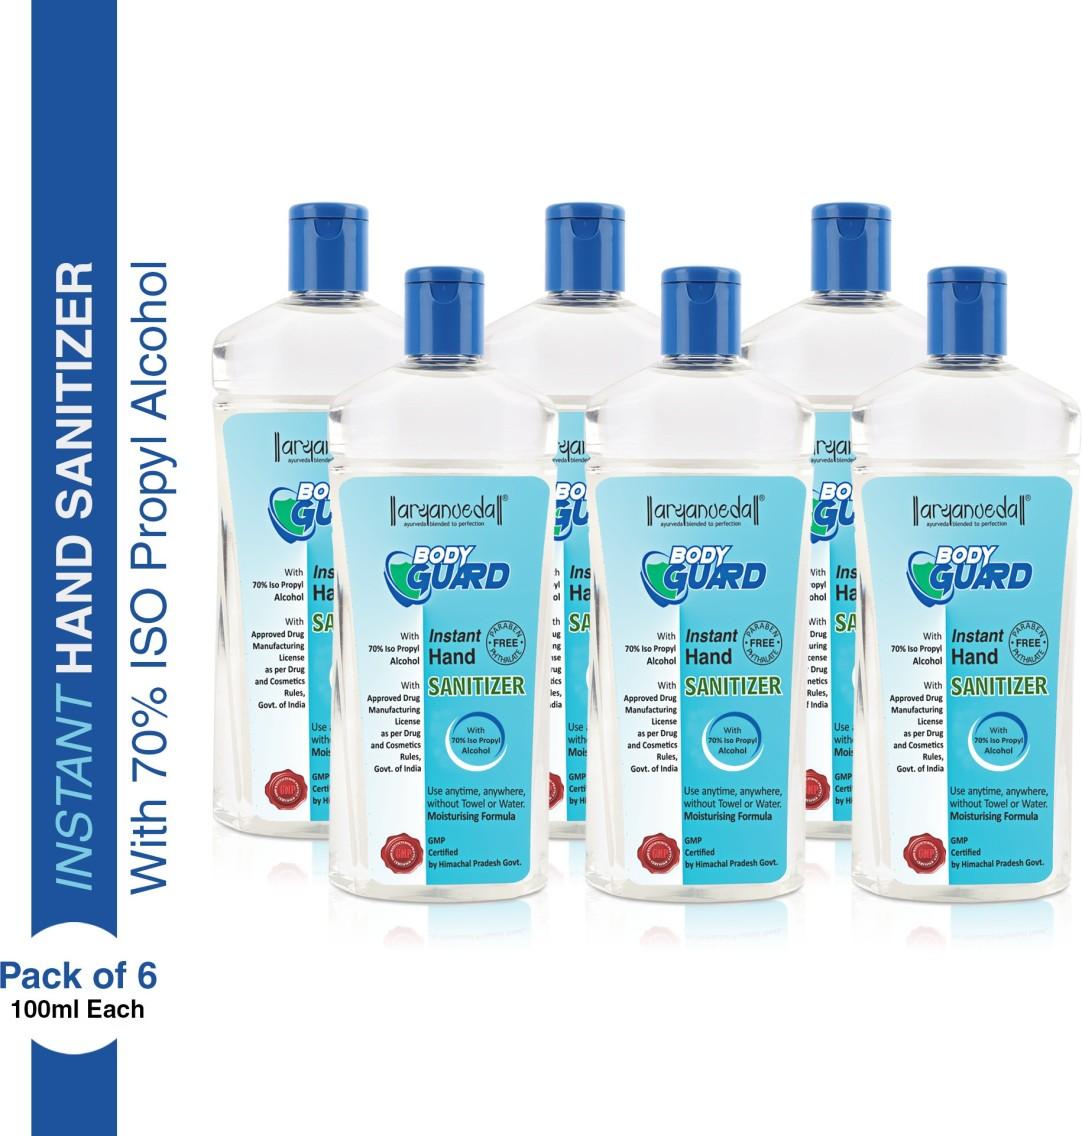 https://cdn0.desidime.com/attachments/photos/617050/original/100-bodyguard-hand-sanitizer-disinfectant-gel-100-ml-each-pack-original-imafpwzfsxdcya5b.jpeg?1589543703